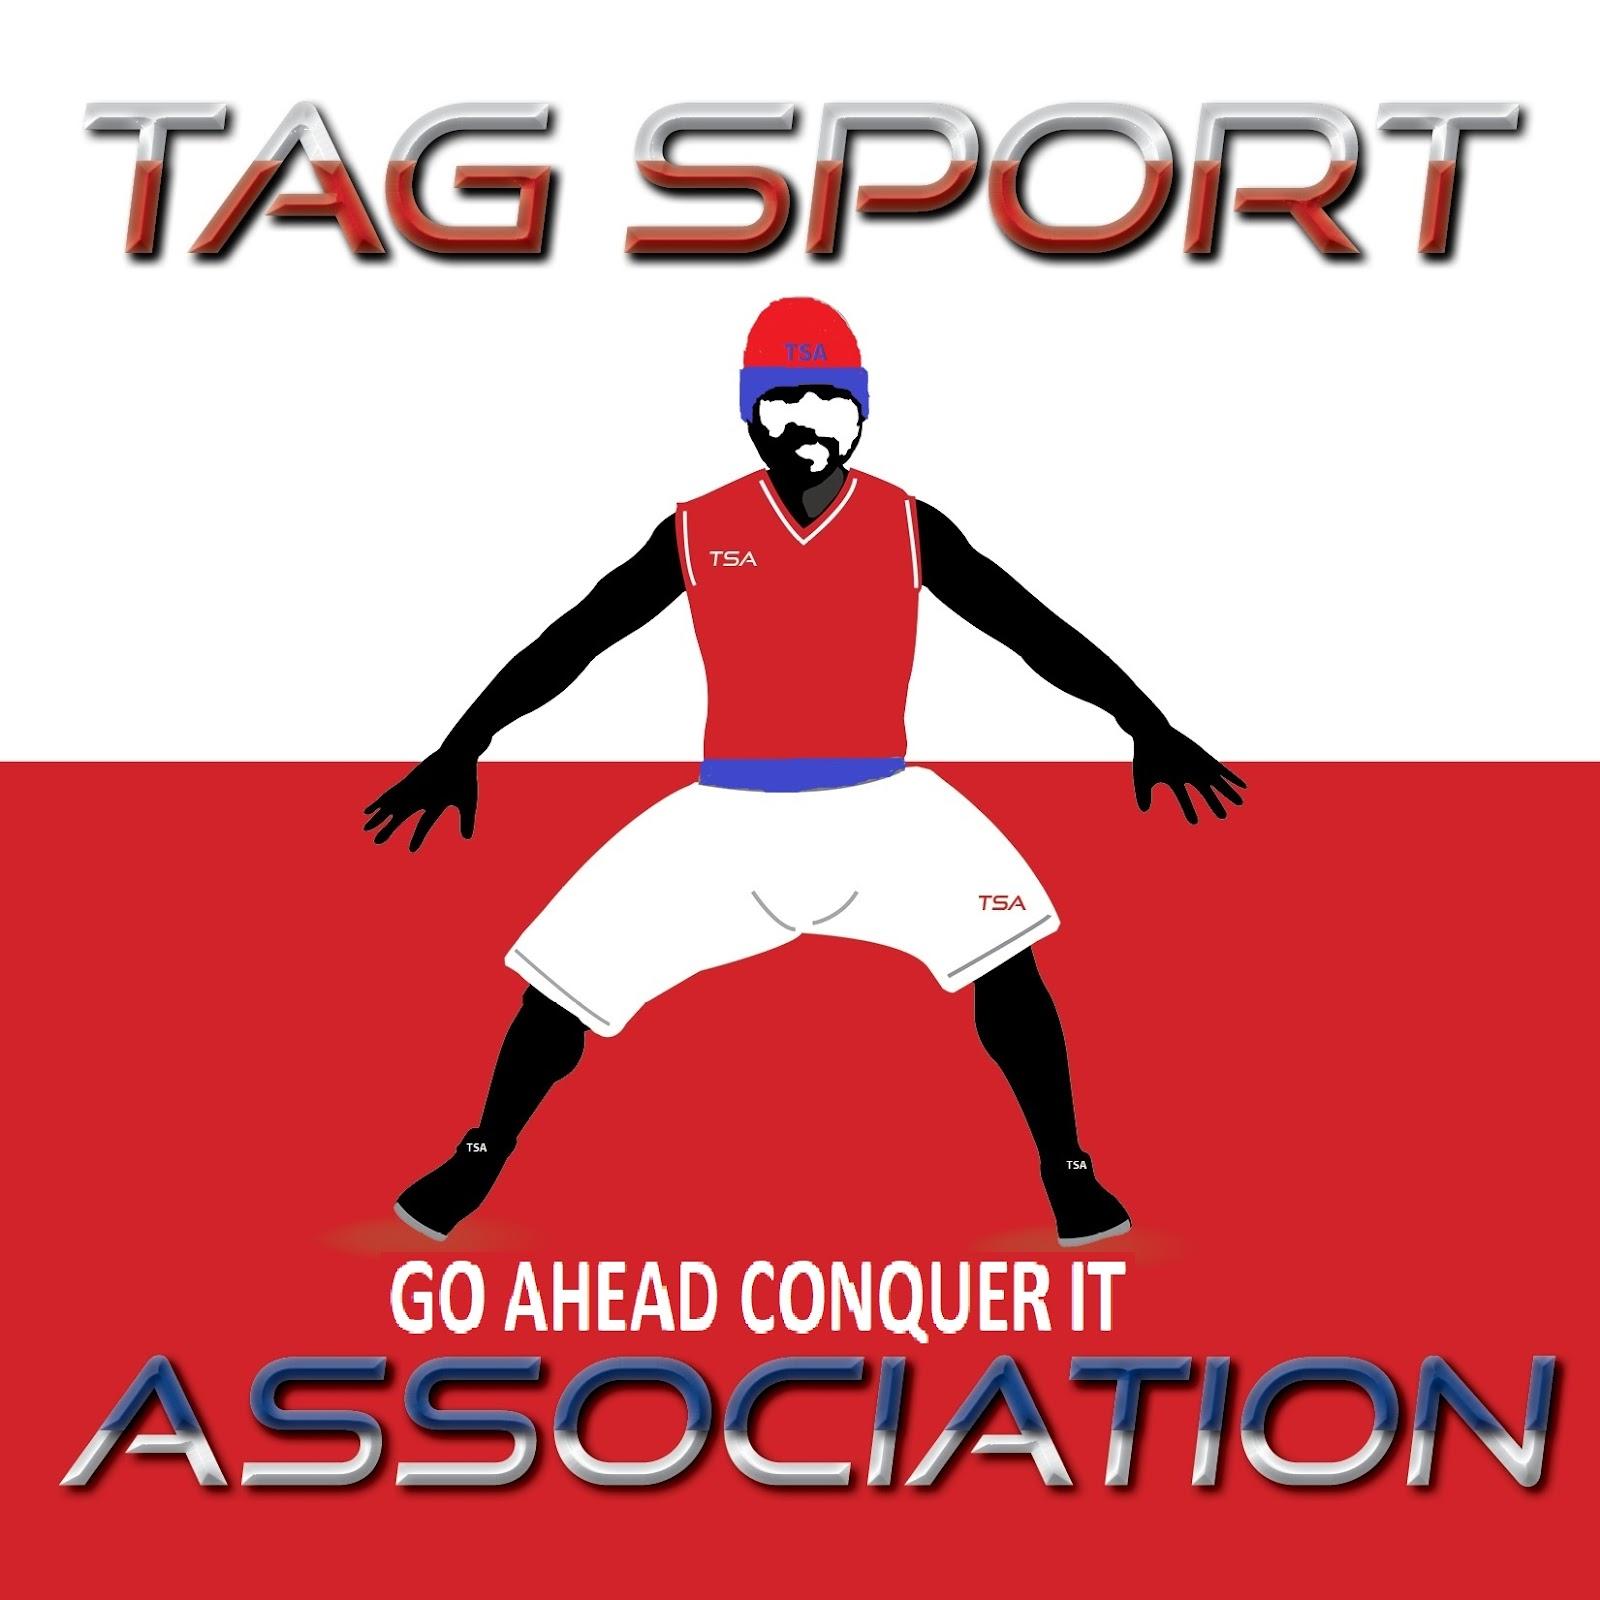 TAGSPORT ASSOCIACIATION GO AHEAD AND CONQUER IT